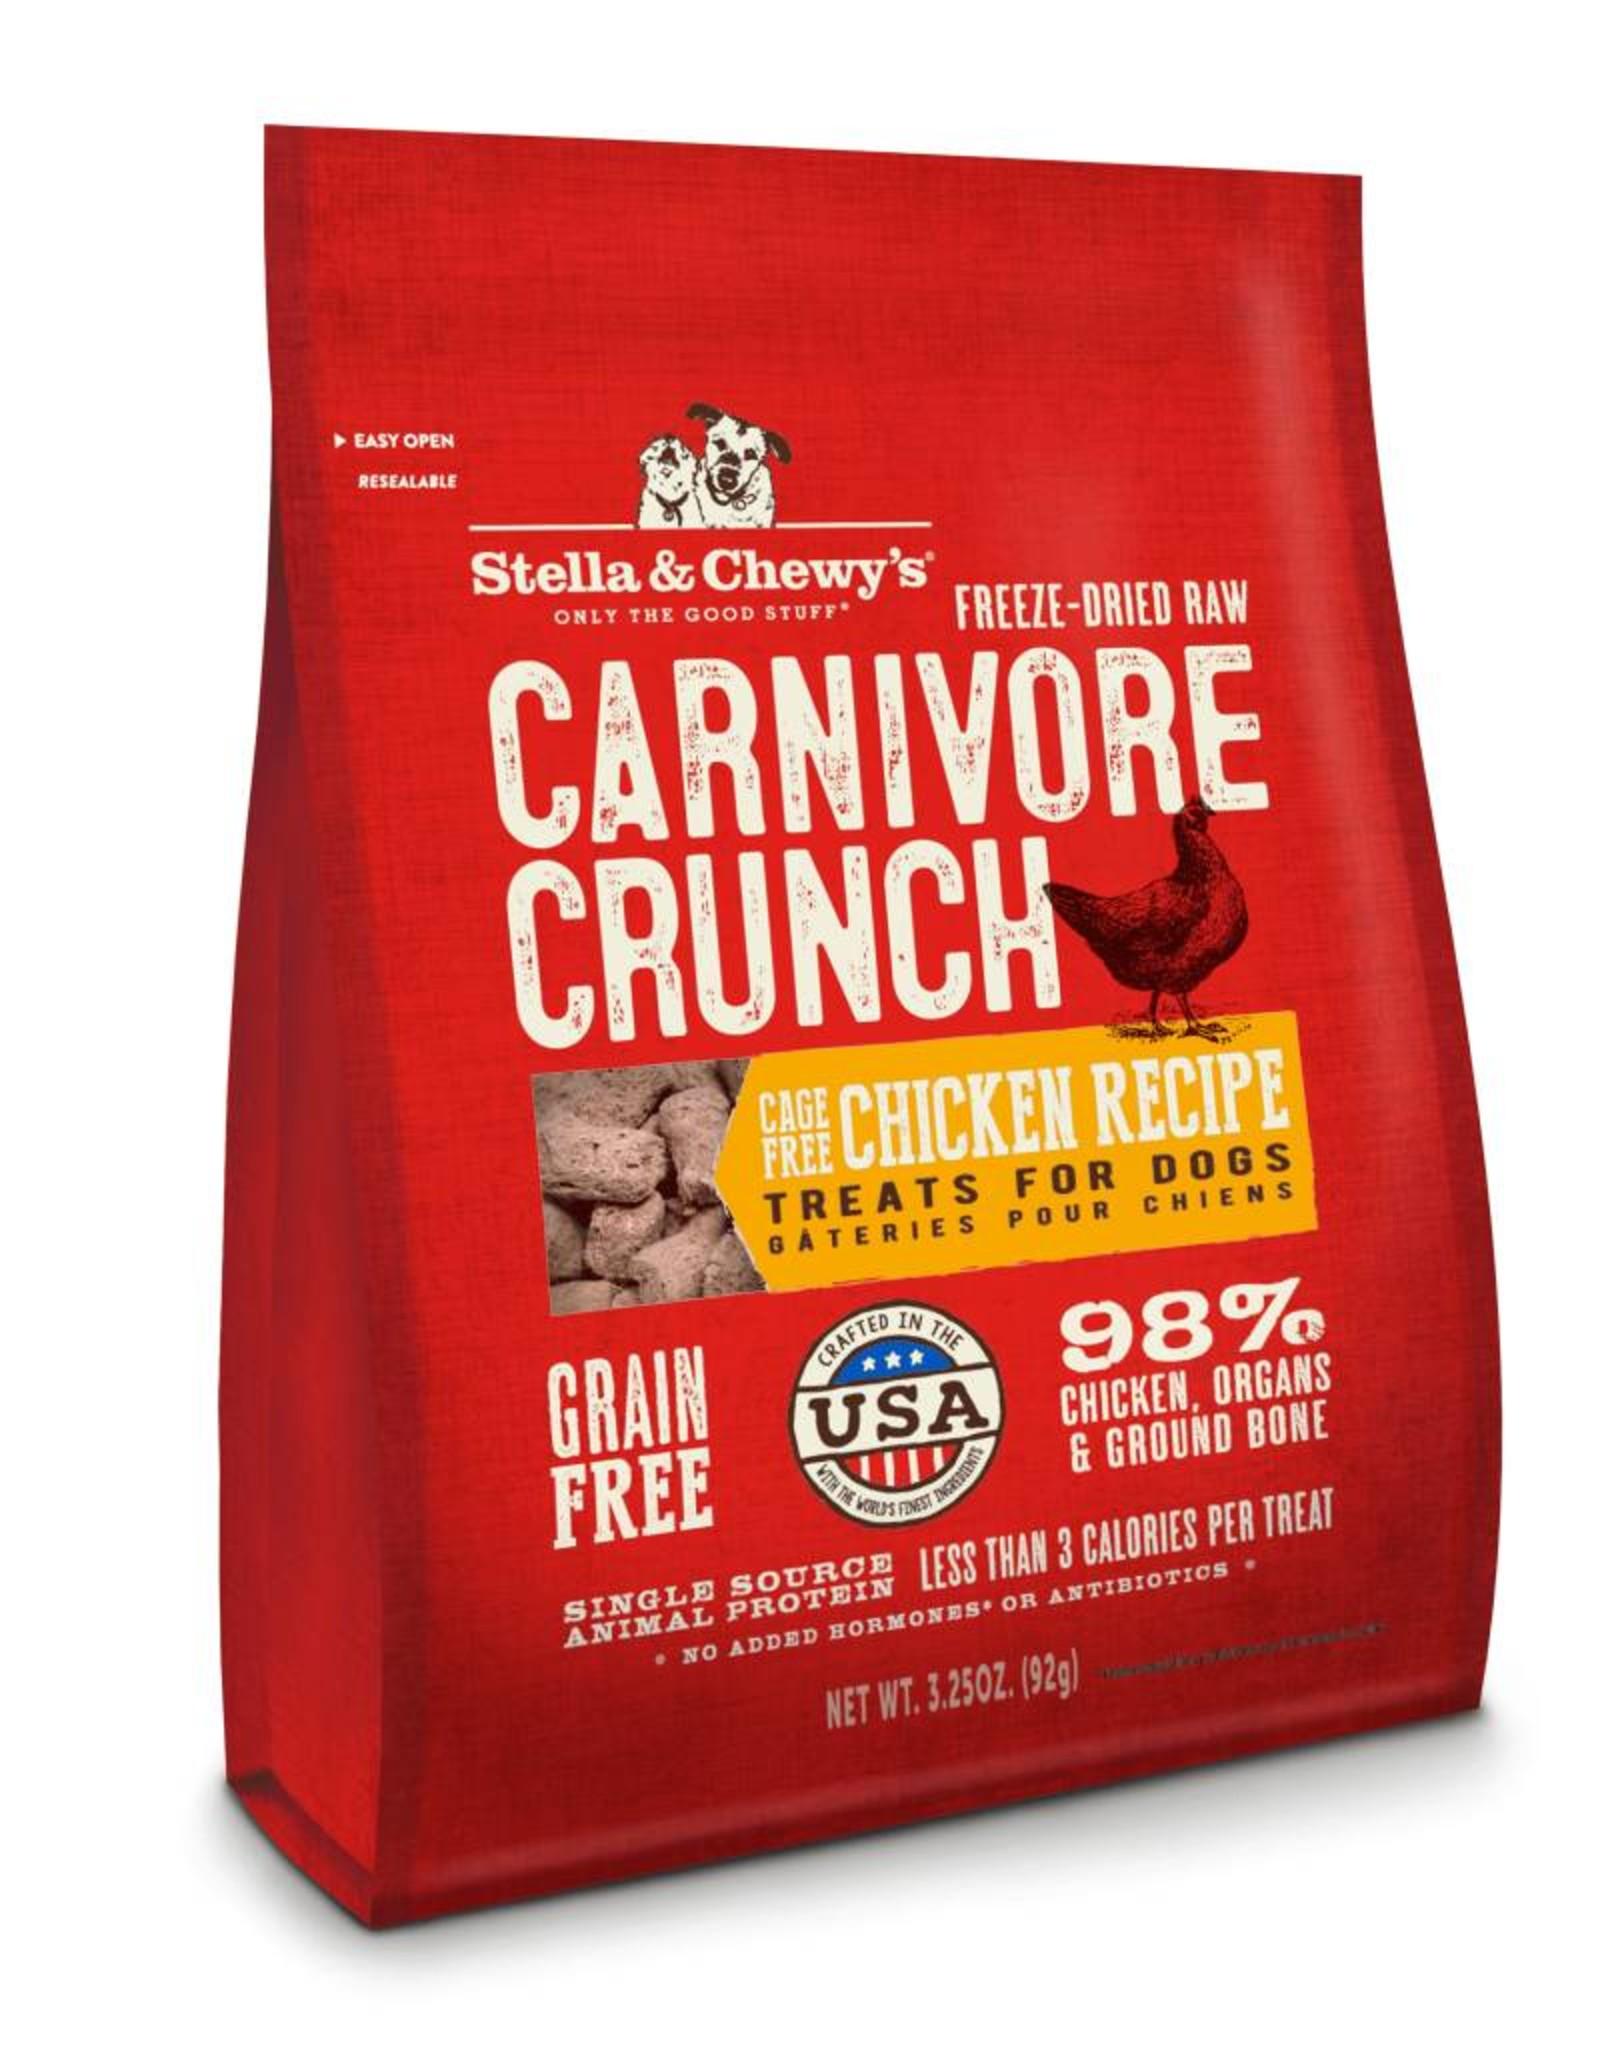 Stella & Chewy's Stella & Chewy's Carnivore Crunch Cage-Free Chicken Recipe Dog Treat- 3.25 oz. bag